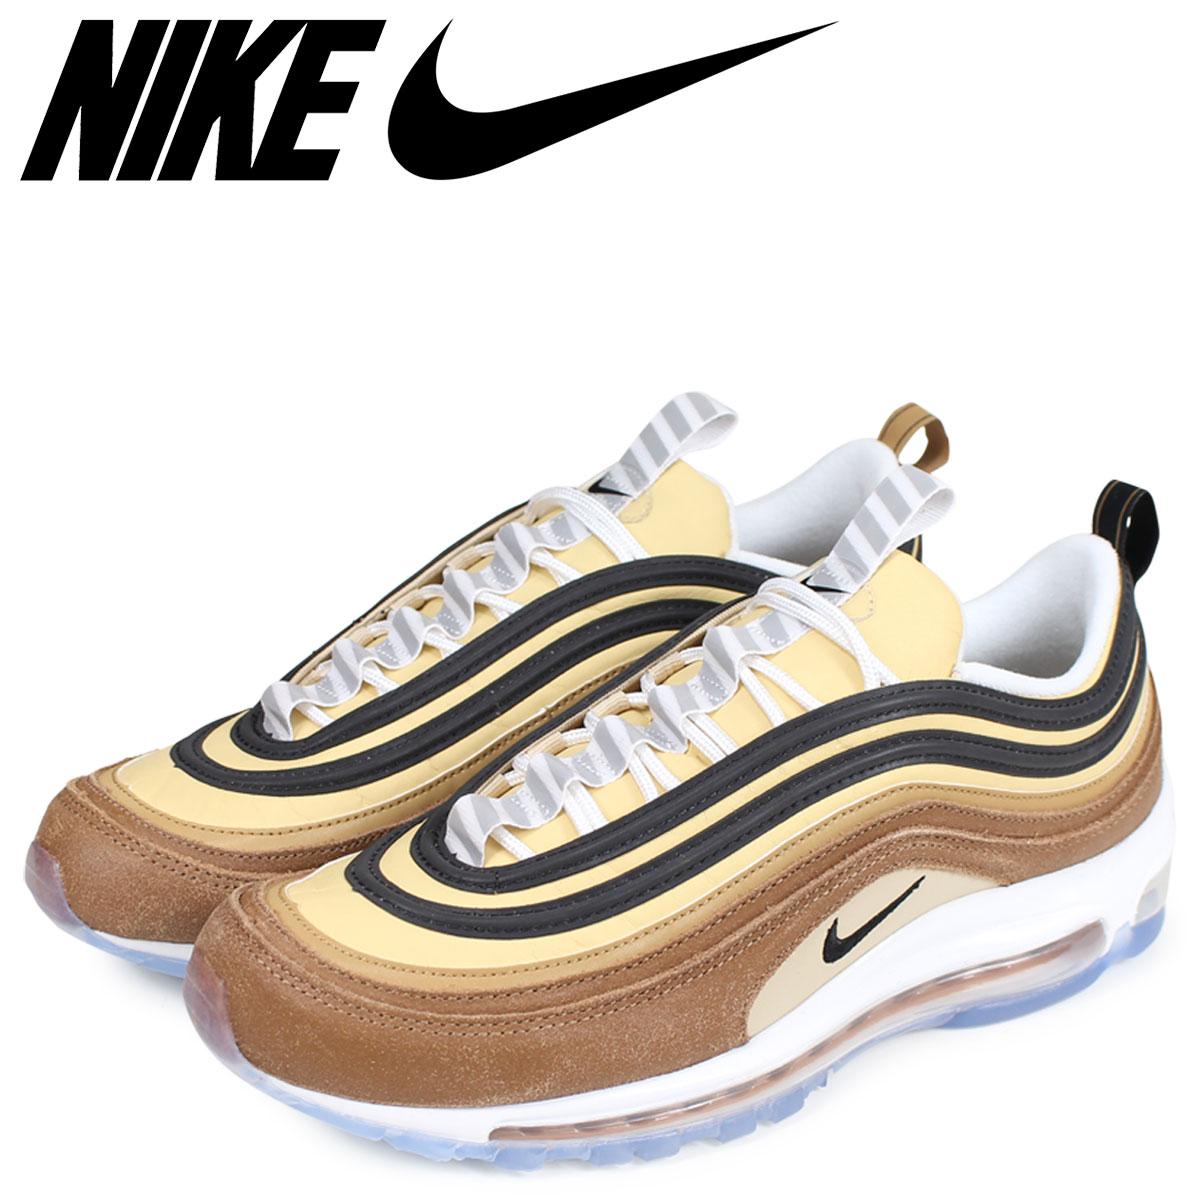 NIKE Kie Ney AMAX 97 sneakers men AIR MAX 97 brown 921,826 201